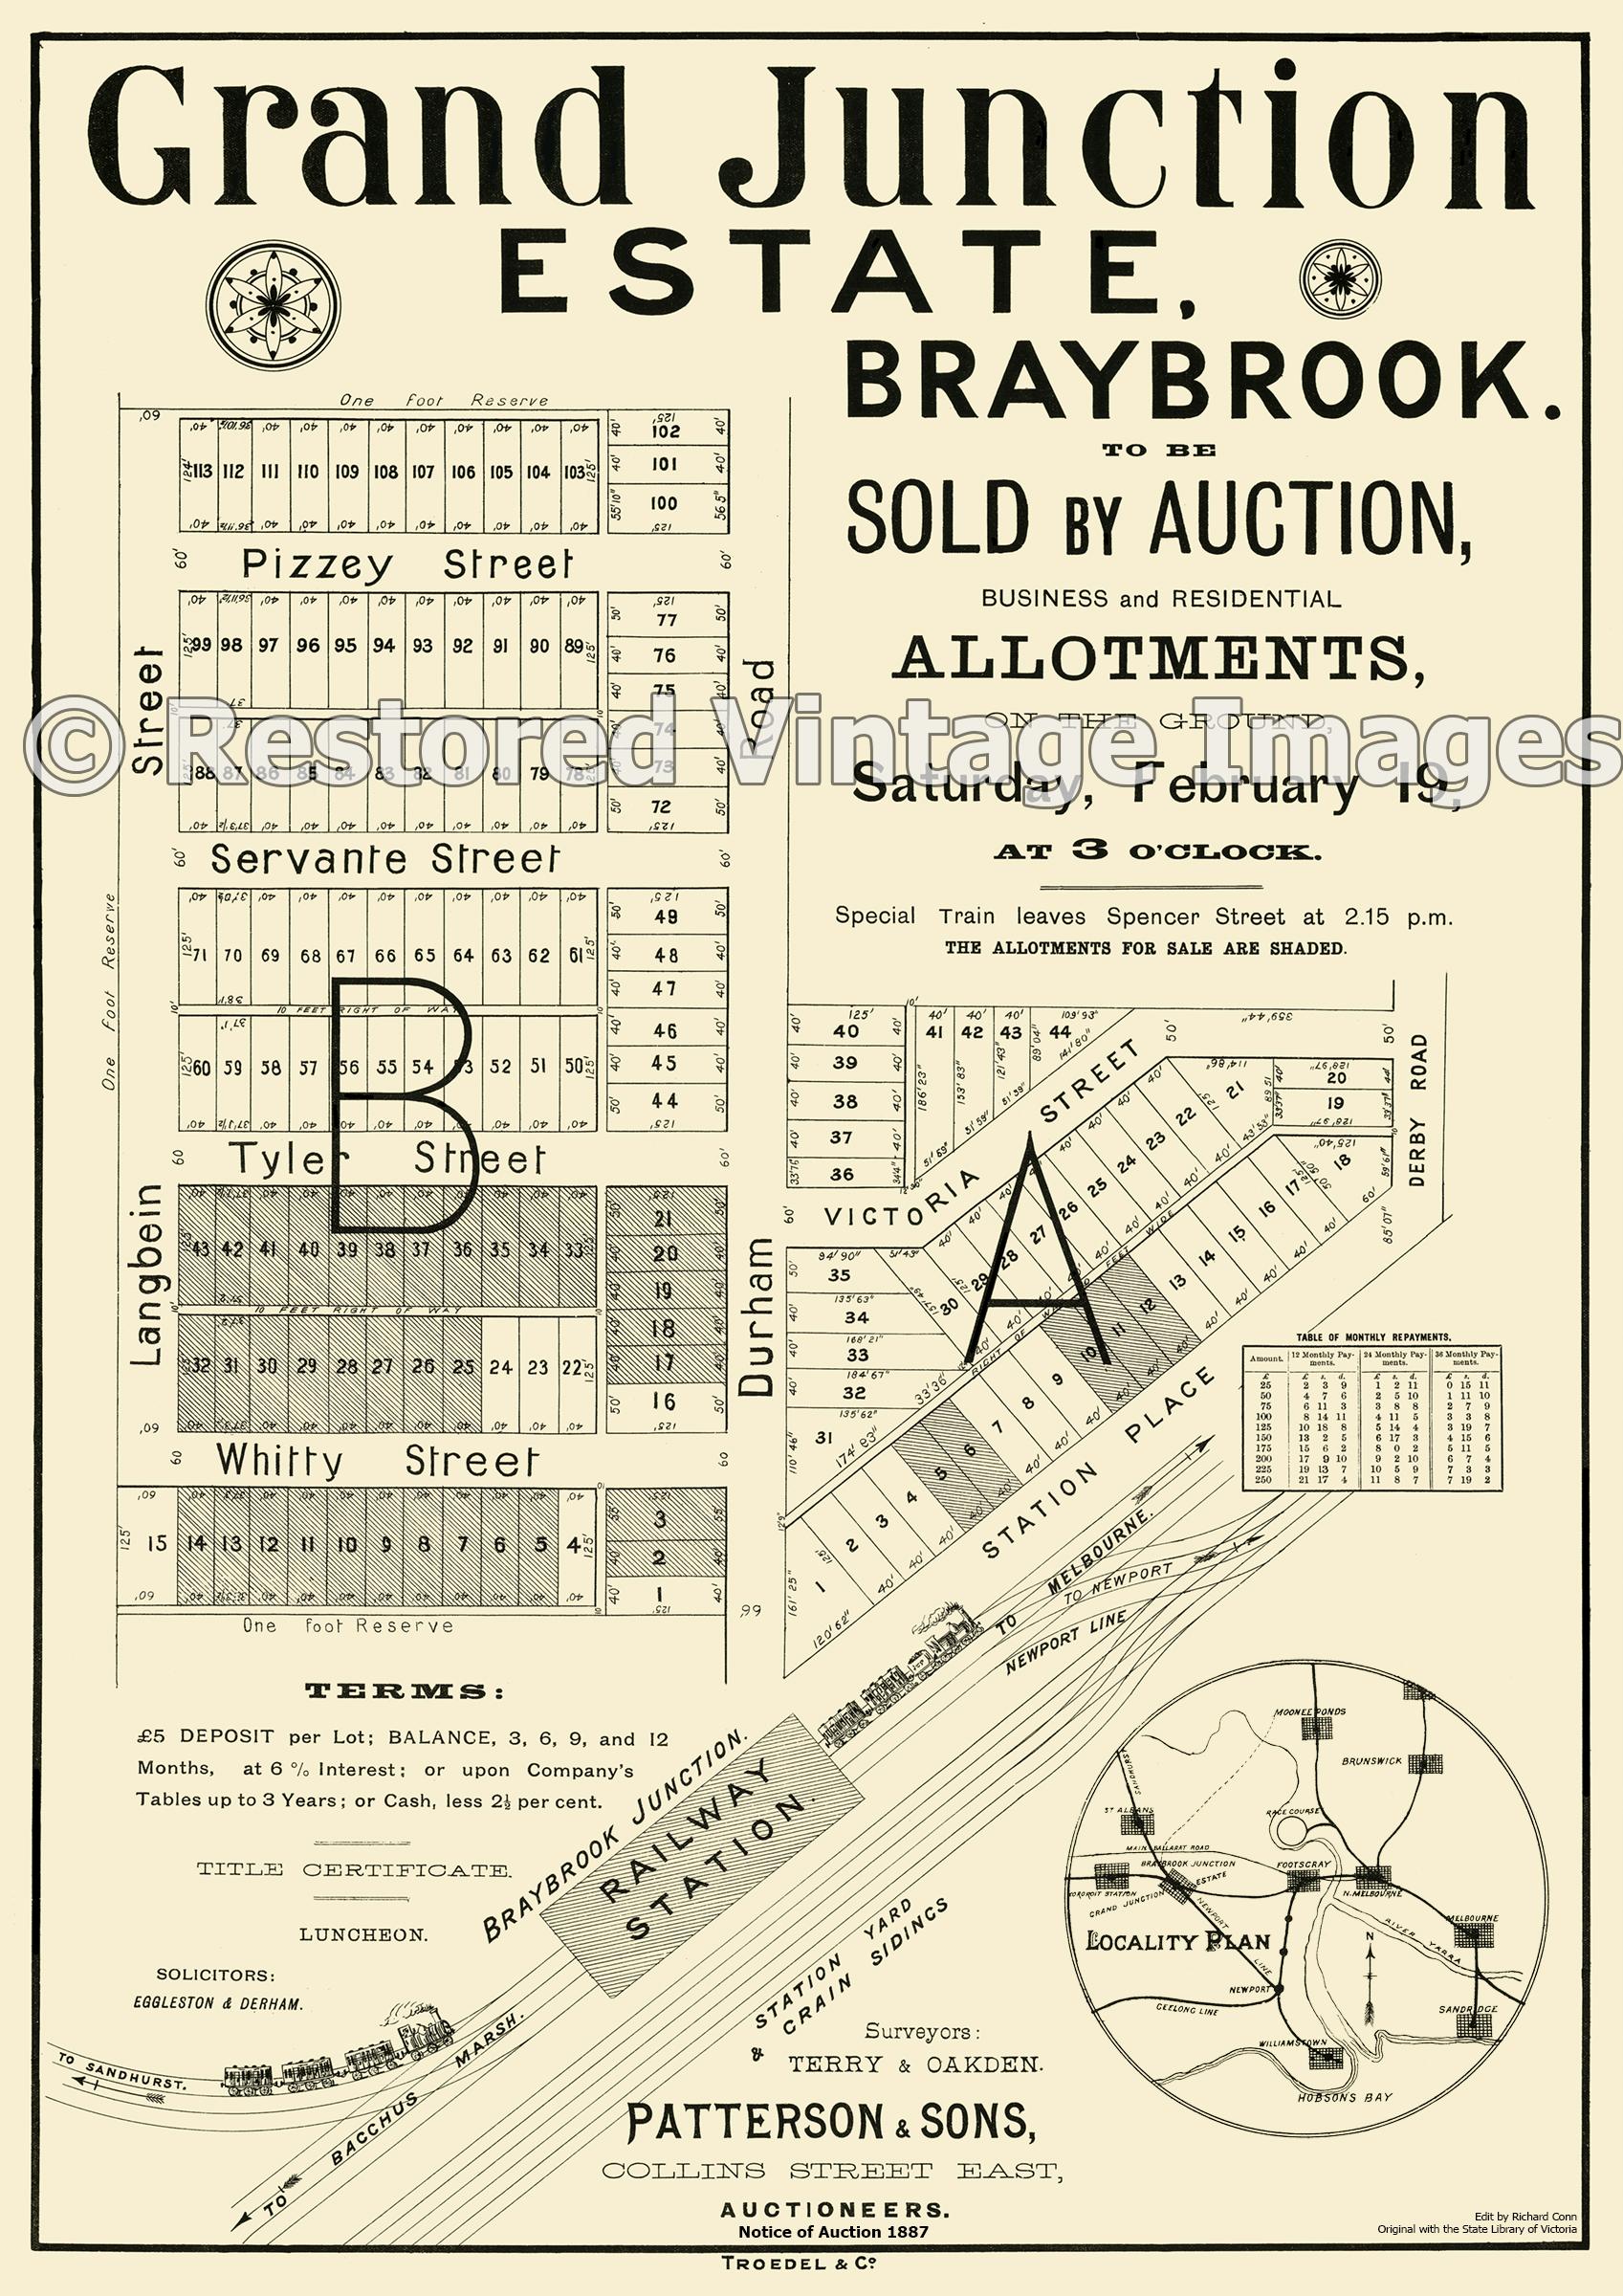 Grand Junction Estate Braybrook 19th November 1887 – Sunshine